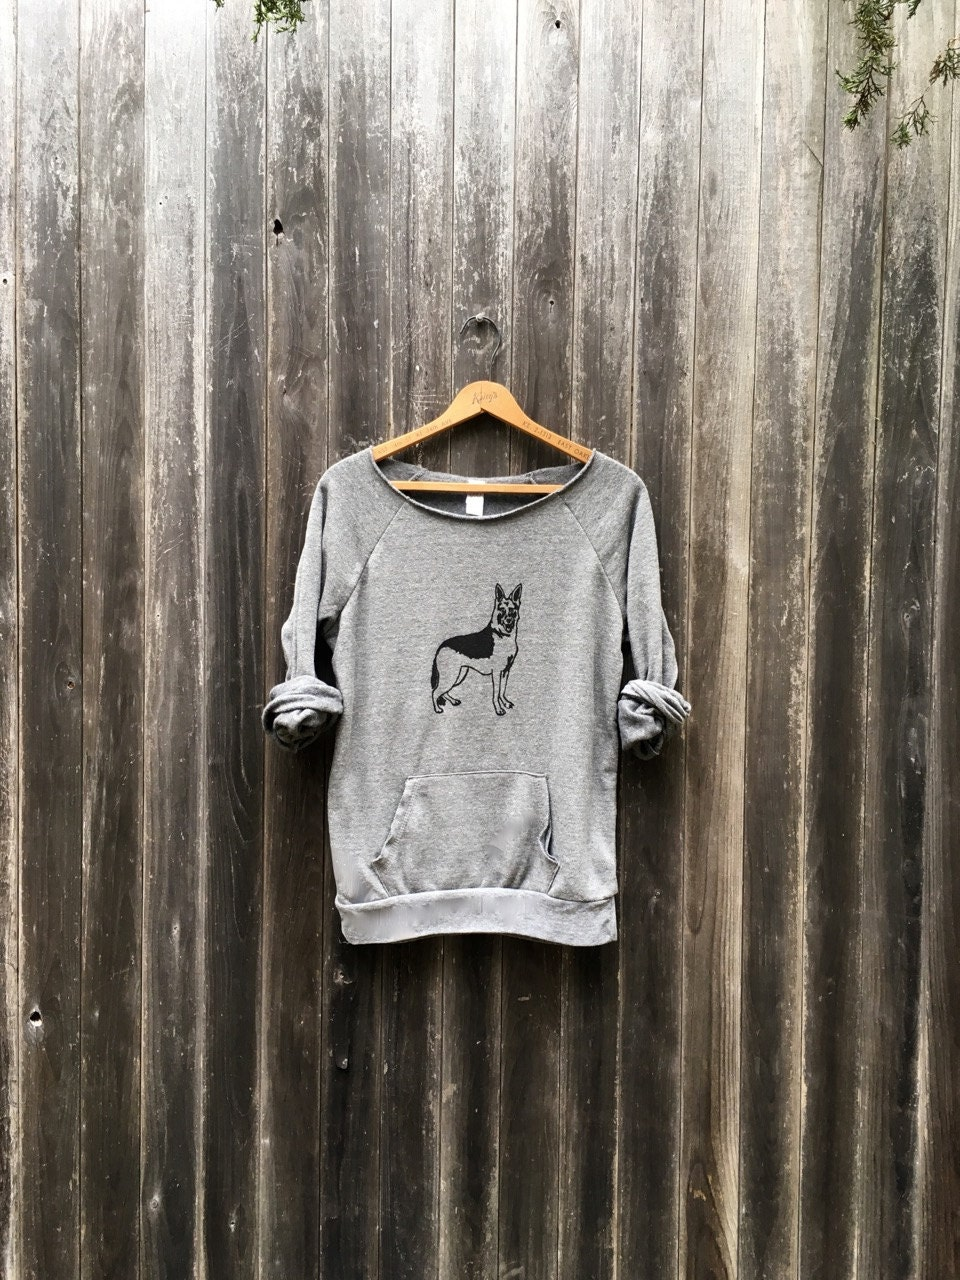 i got your back German Shepherd Shirt, Dog Sweater, Cozy Sweater